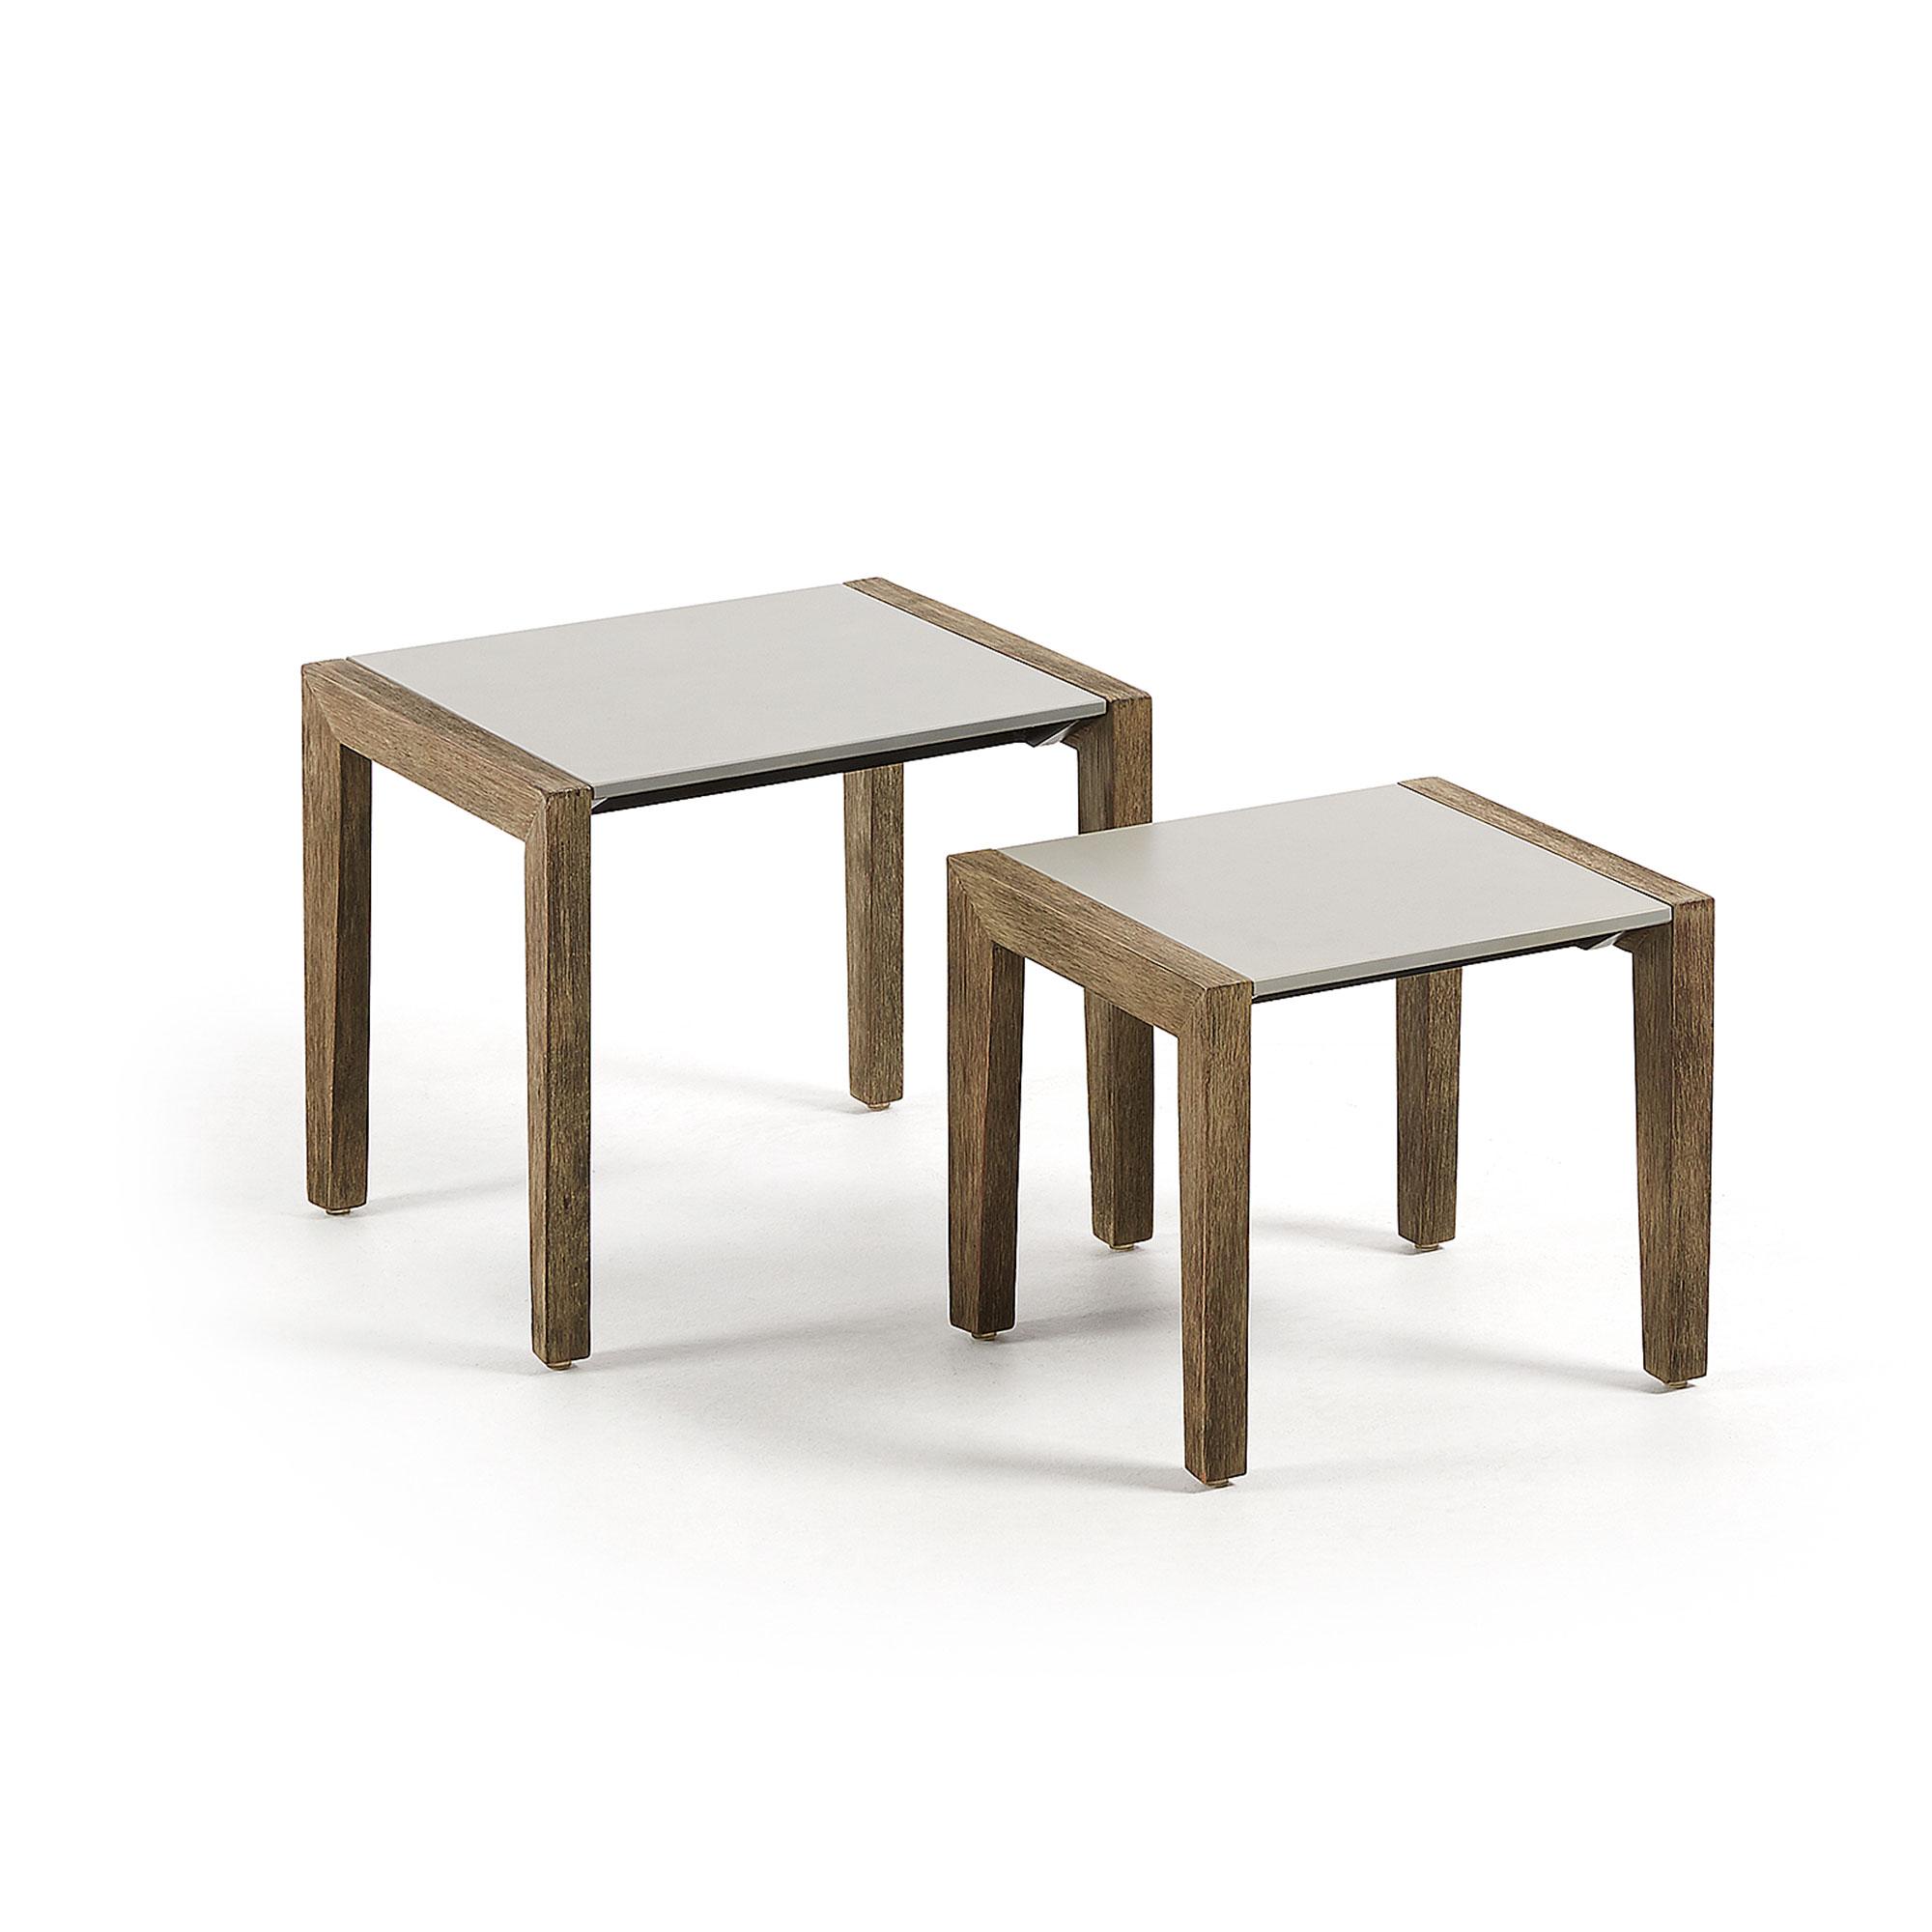 LAFORMA Climby sidebord - lysegrå/grå-brun polycement/eukalyptustræ (sæt à 2)